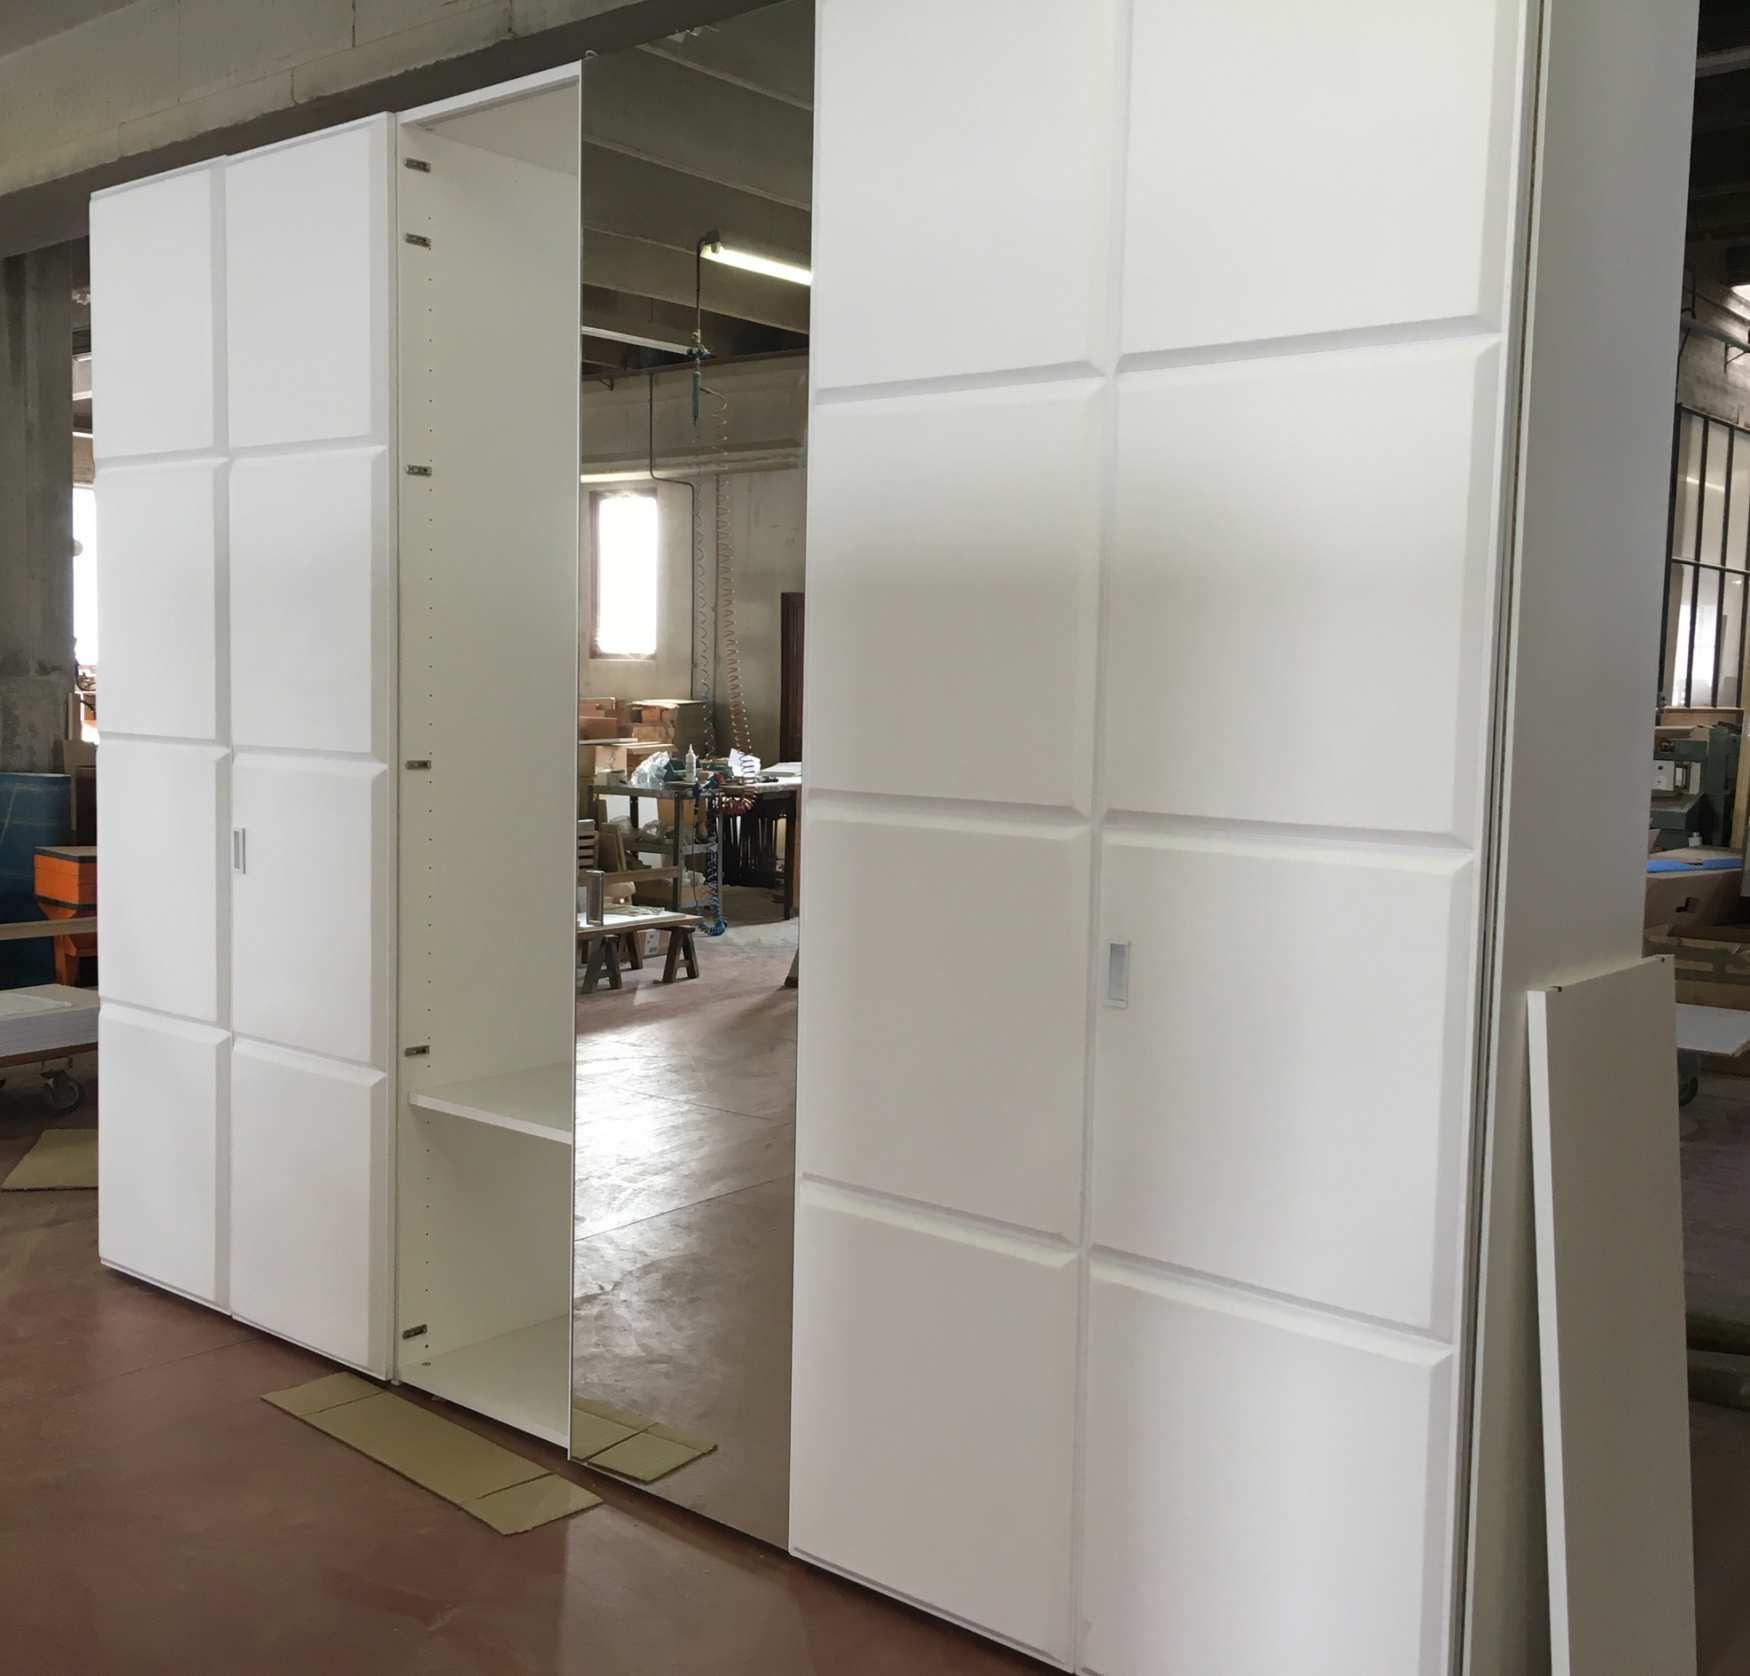 Un armadio speciale milanomondo for Vergani arredamenti